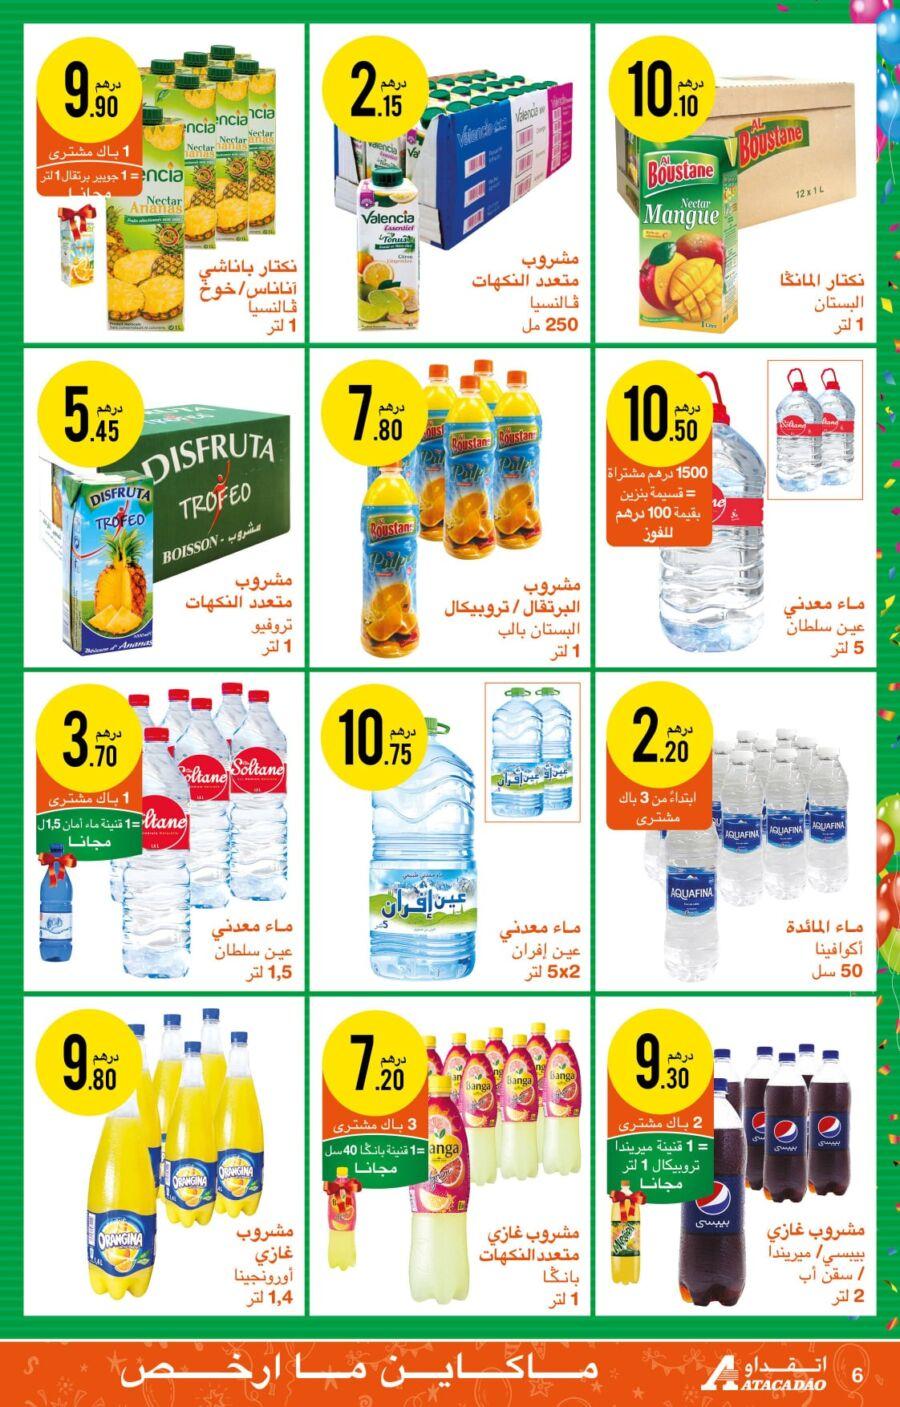 Catalogue Atacadao Maroc عيد ميلاد أرخص الأثمان du 22 Octobre au 11 Novembre 2020